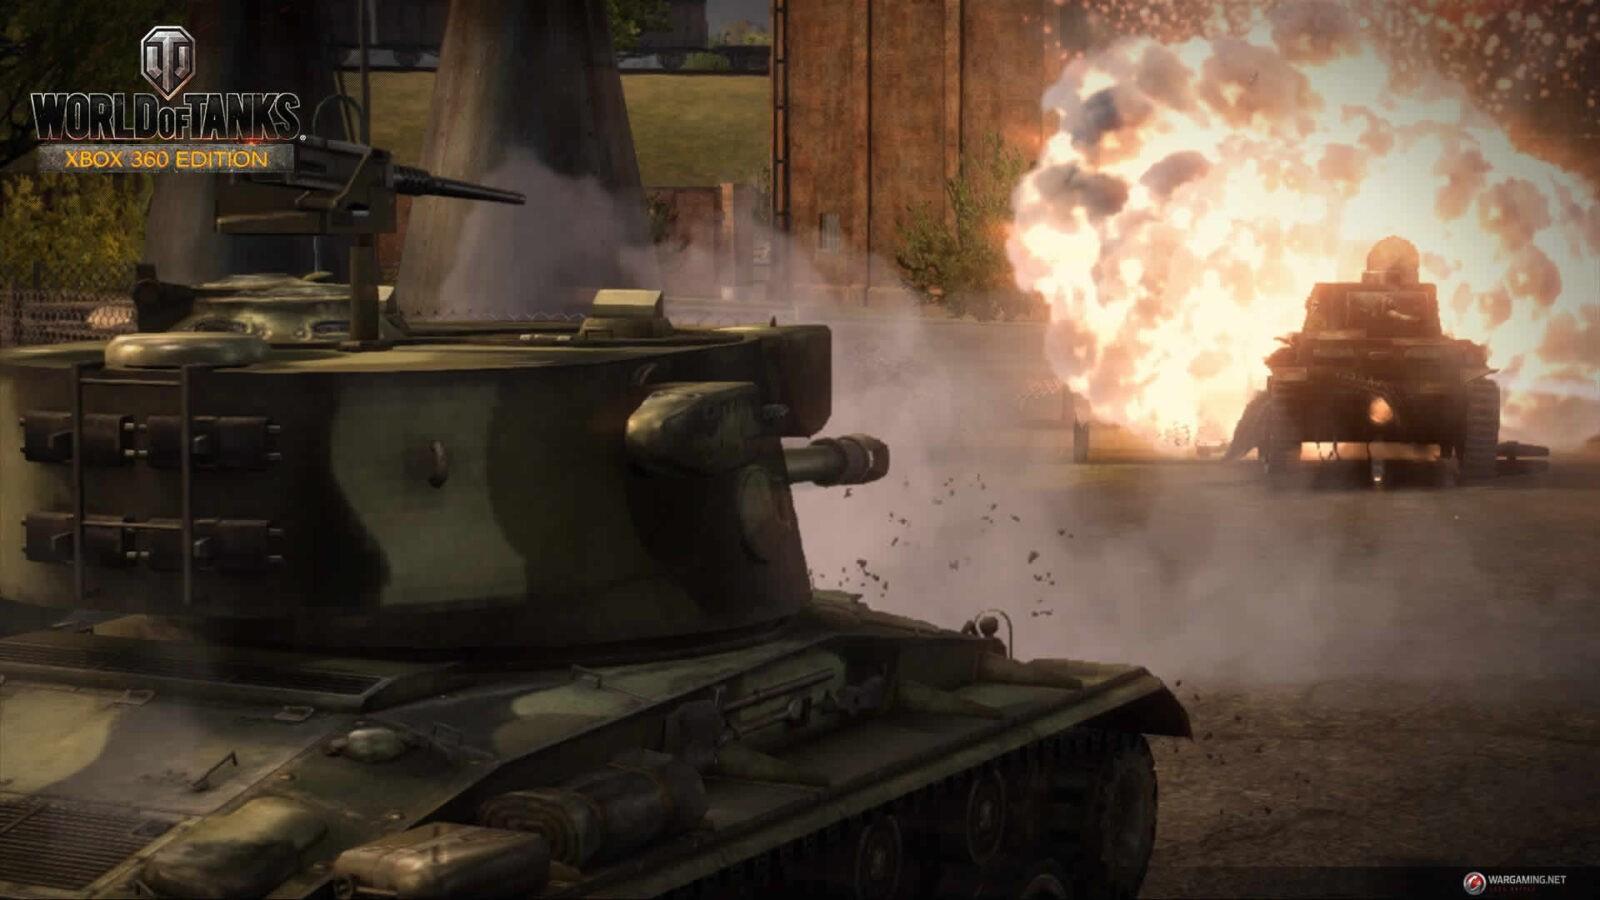 World of Tanks: Xbox 360 Edition (XBOX360) 3